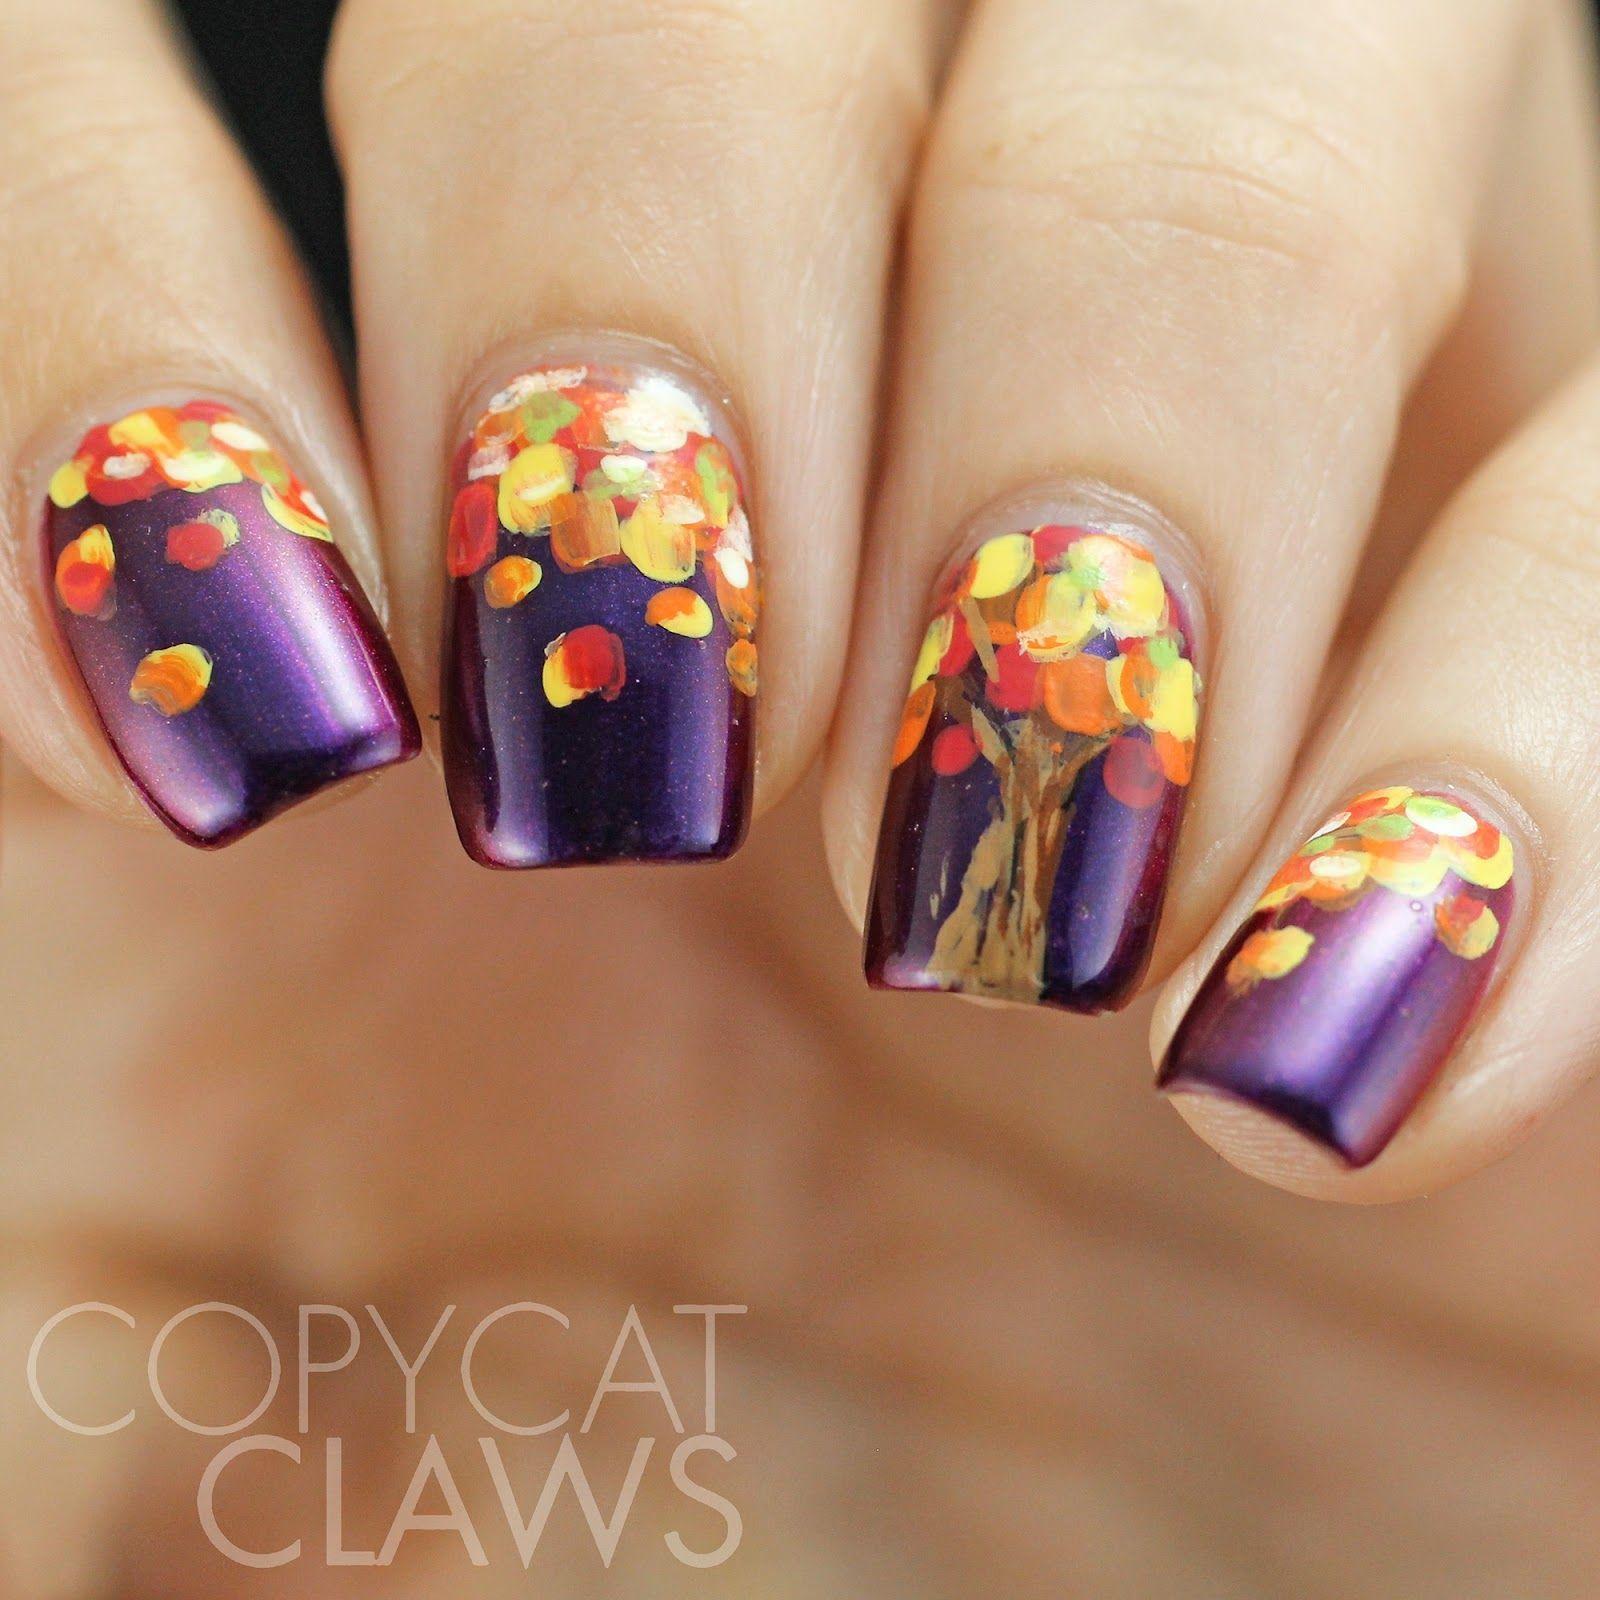 Copycat Claws: HPB Presents Fall Tree Nail Art | nails | Pinterest ...